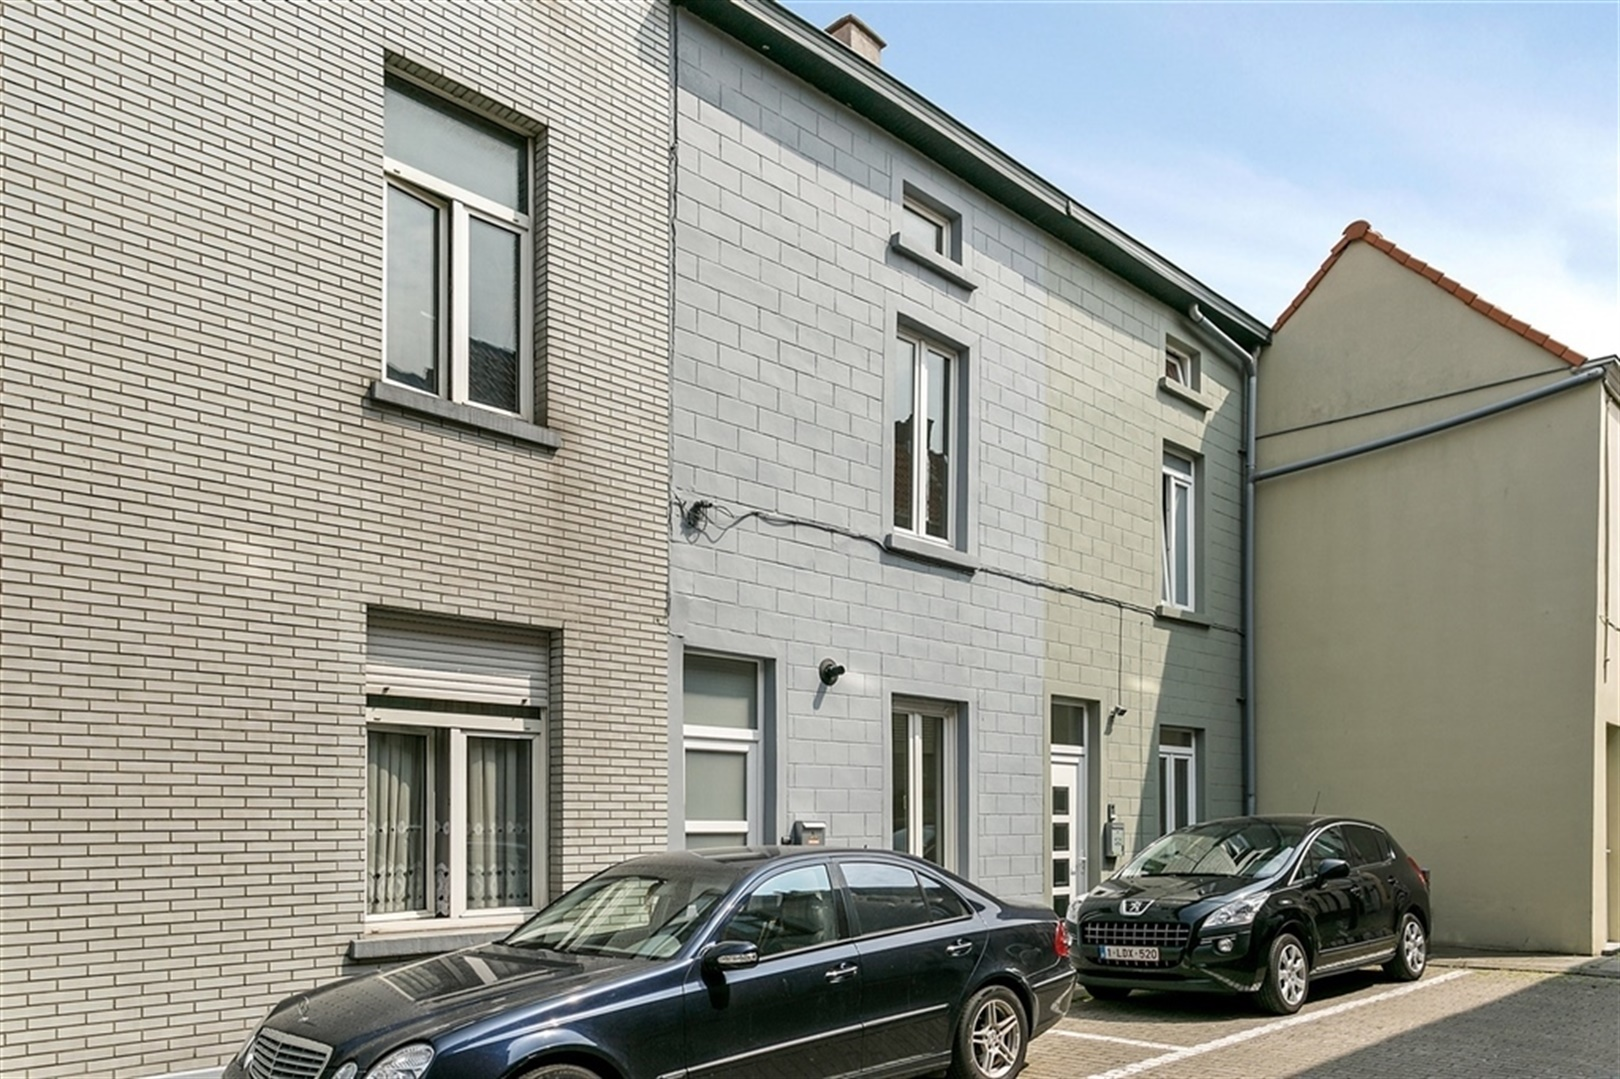 Charmante, instapklare woning nabij Dok-Noord